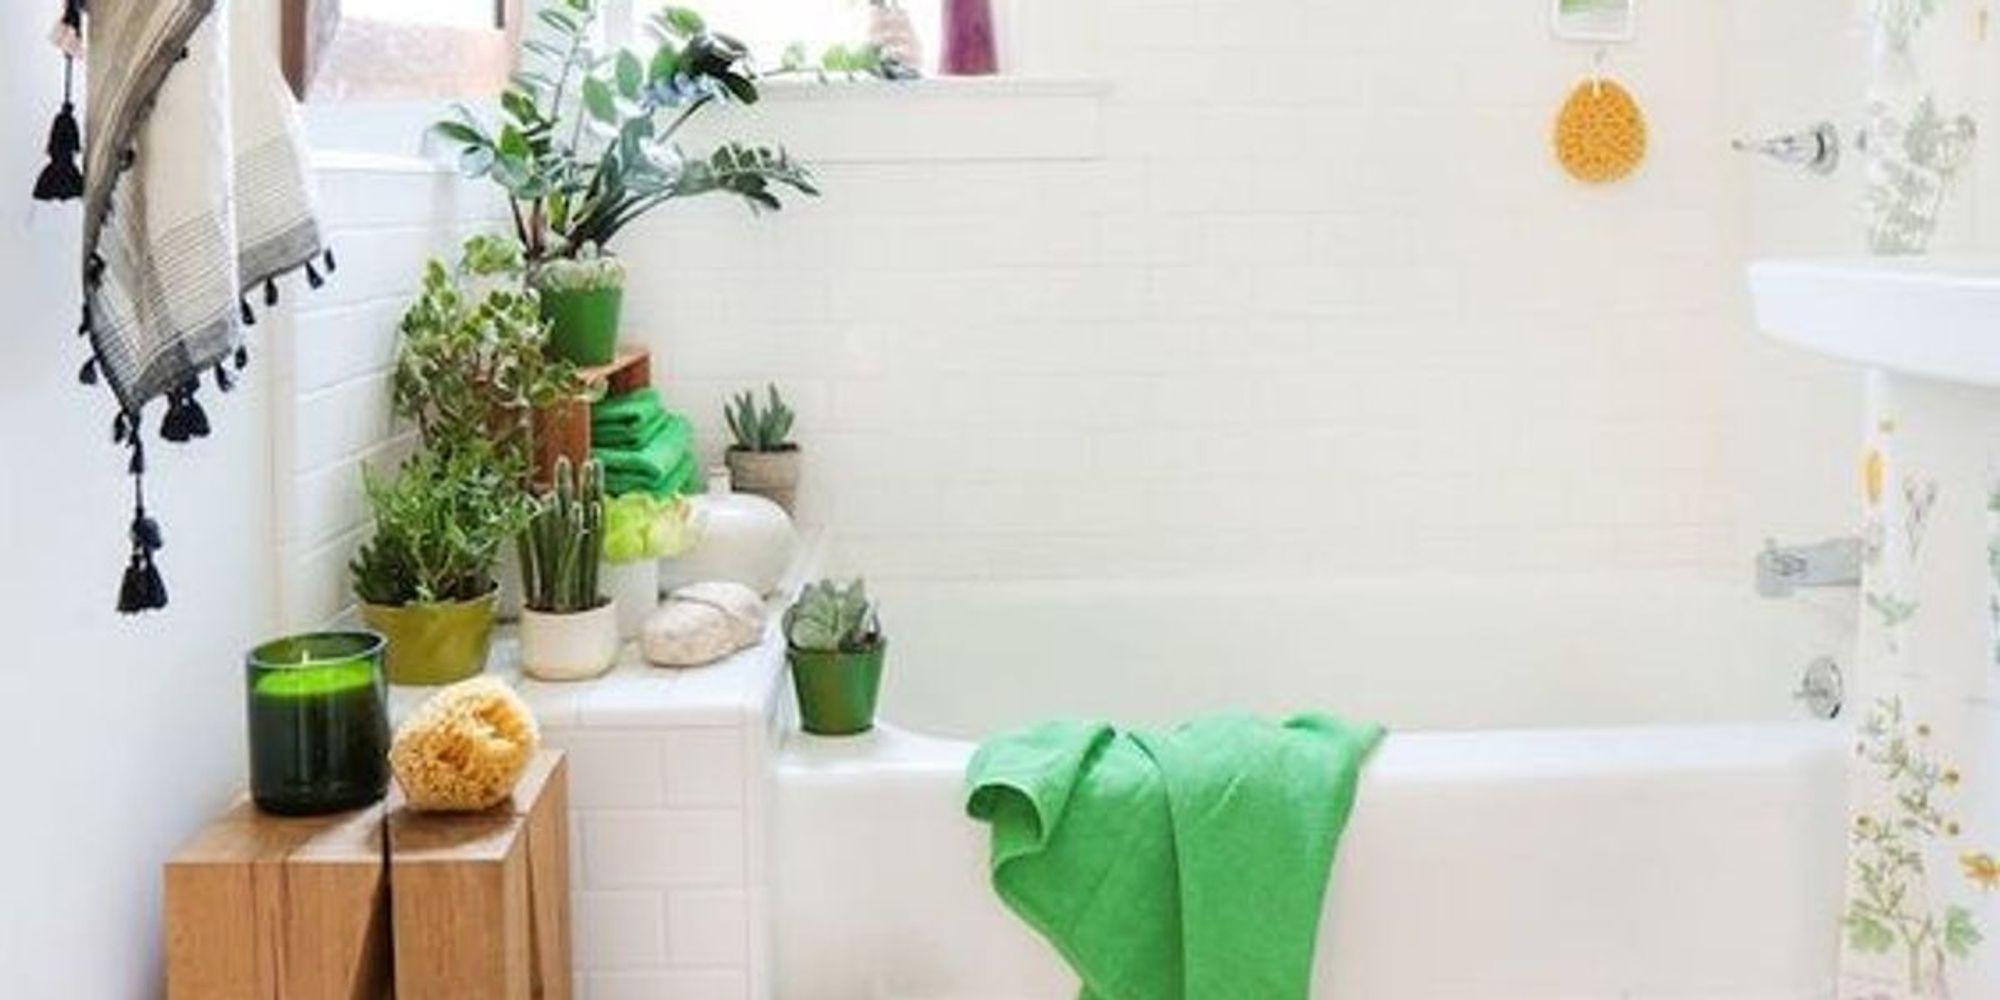 15 ways to make a small bathroom escape